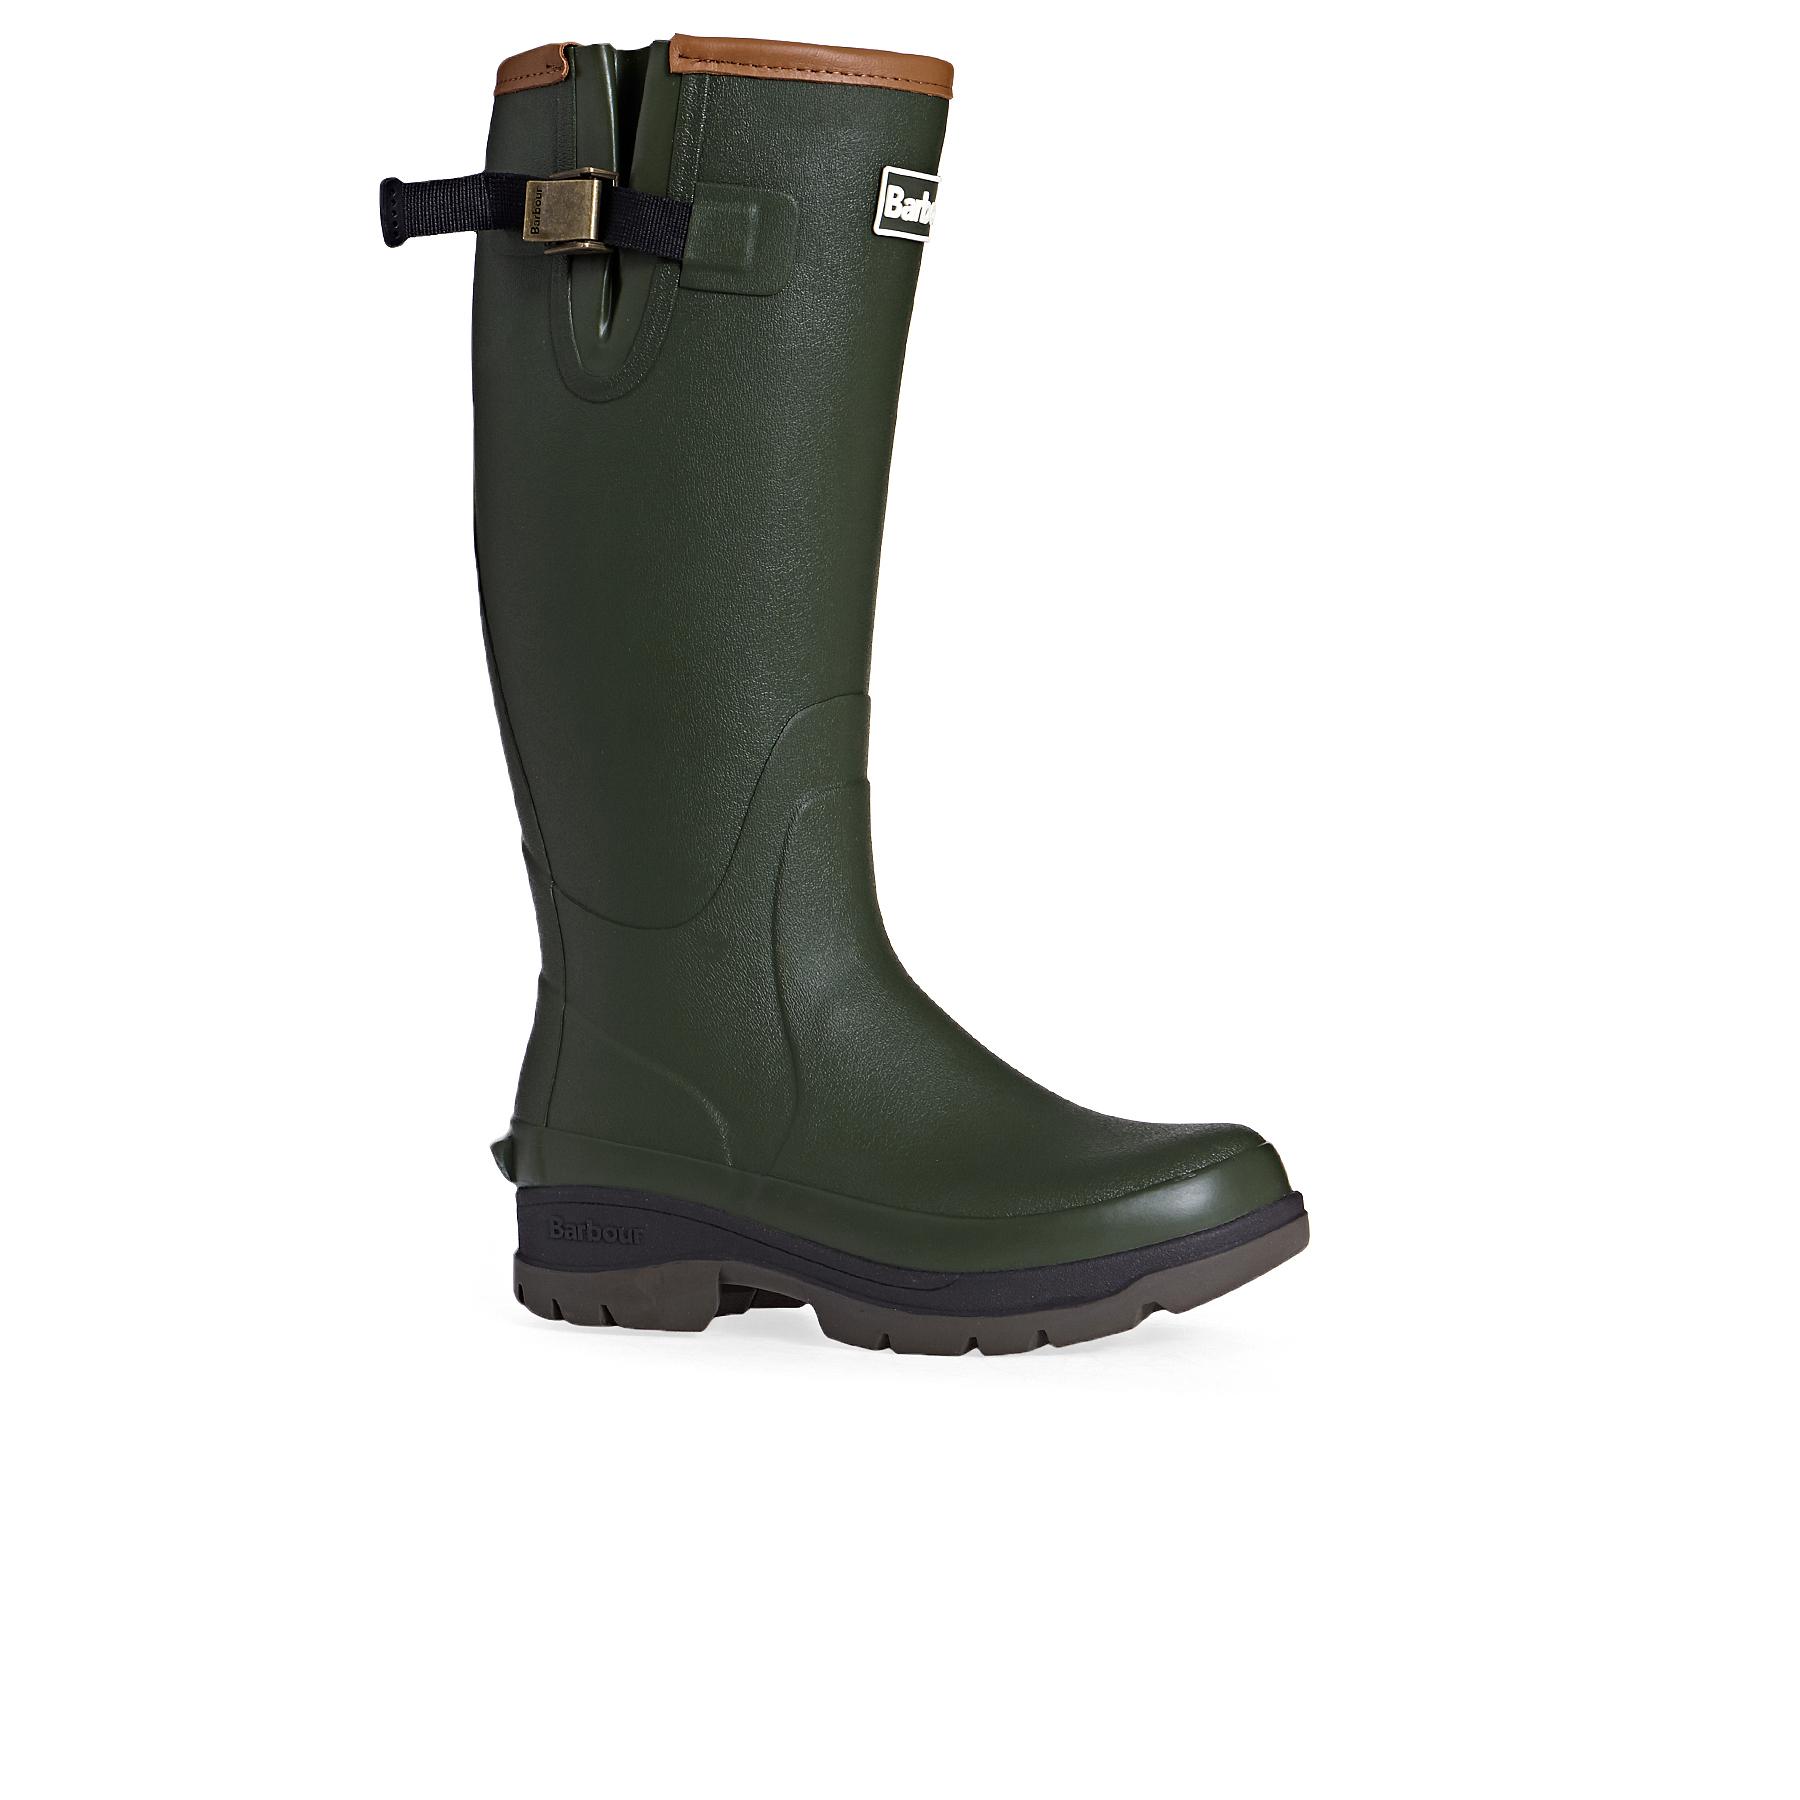 Wellington Boots - Olive